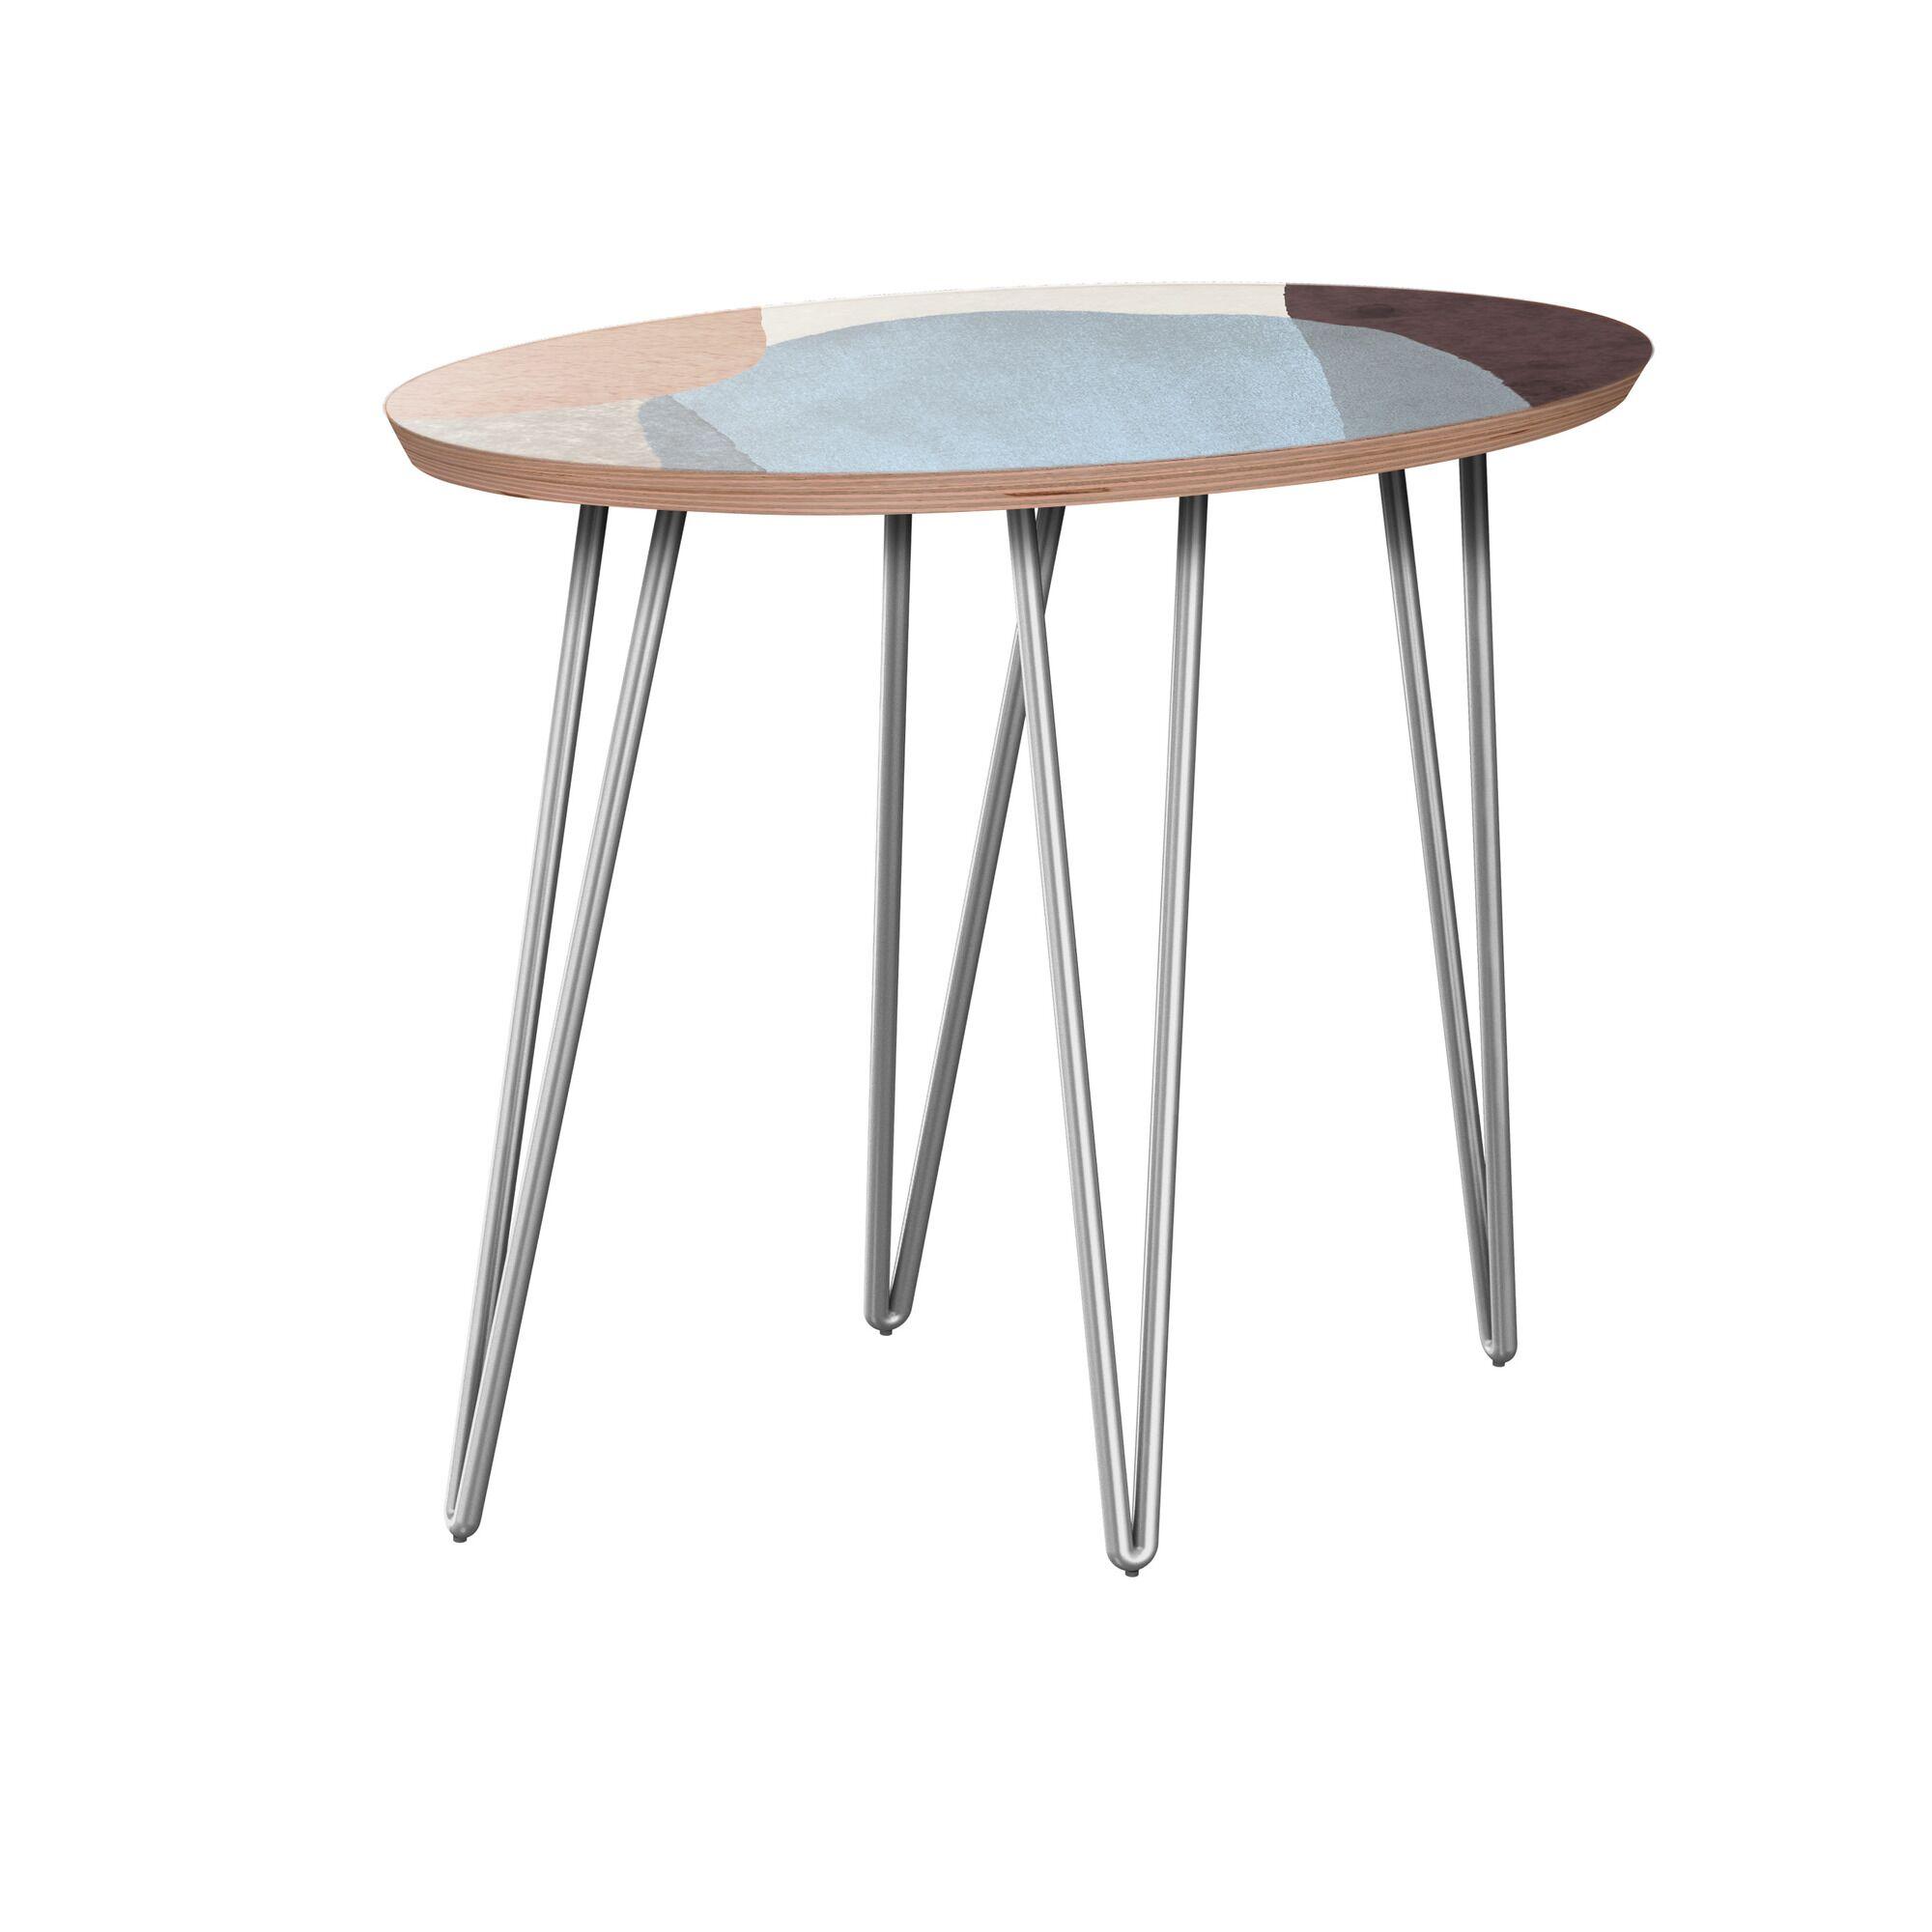 Kalyssa End Table Table Base Color: Chrome, Table Top Color: Walnut